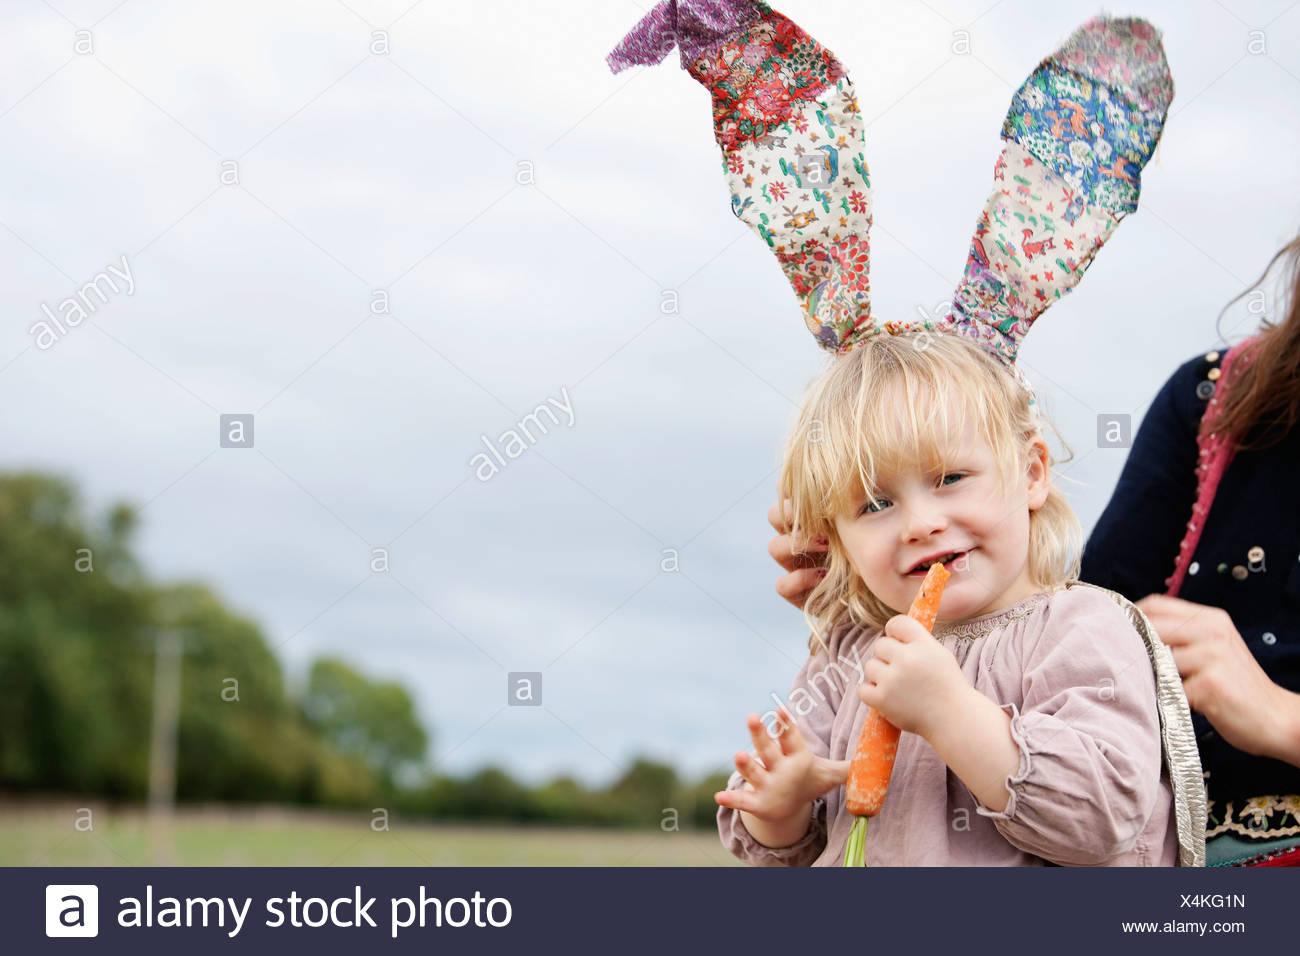 Children Easter Bunny Stock Photos Amp Children Easter Bunny